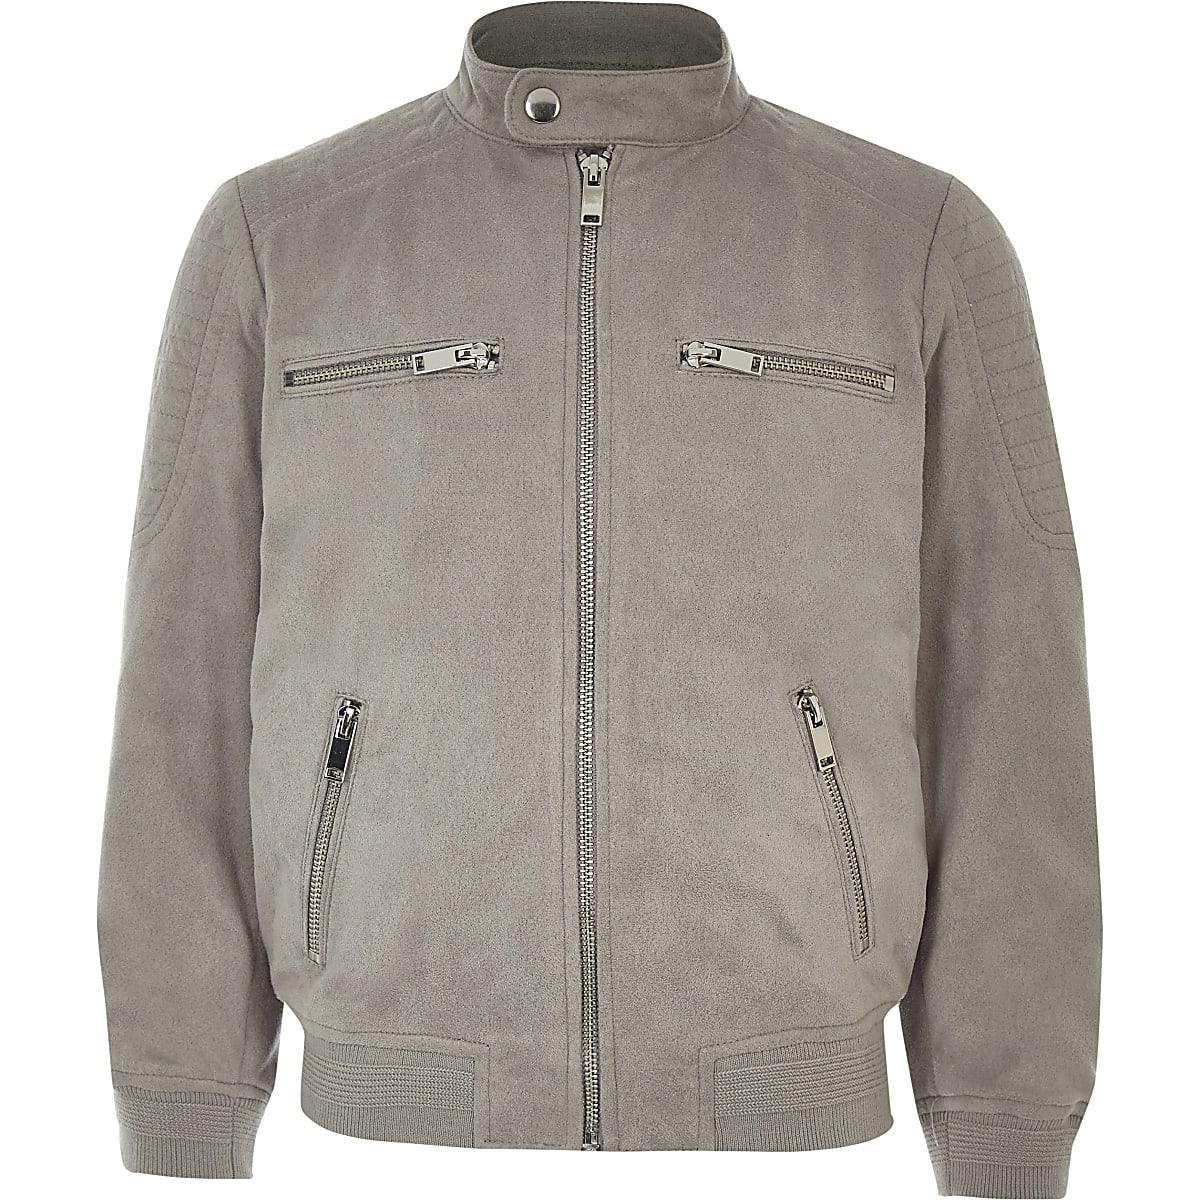 Boys grey faux suede racer jacket